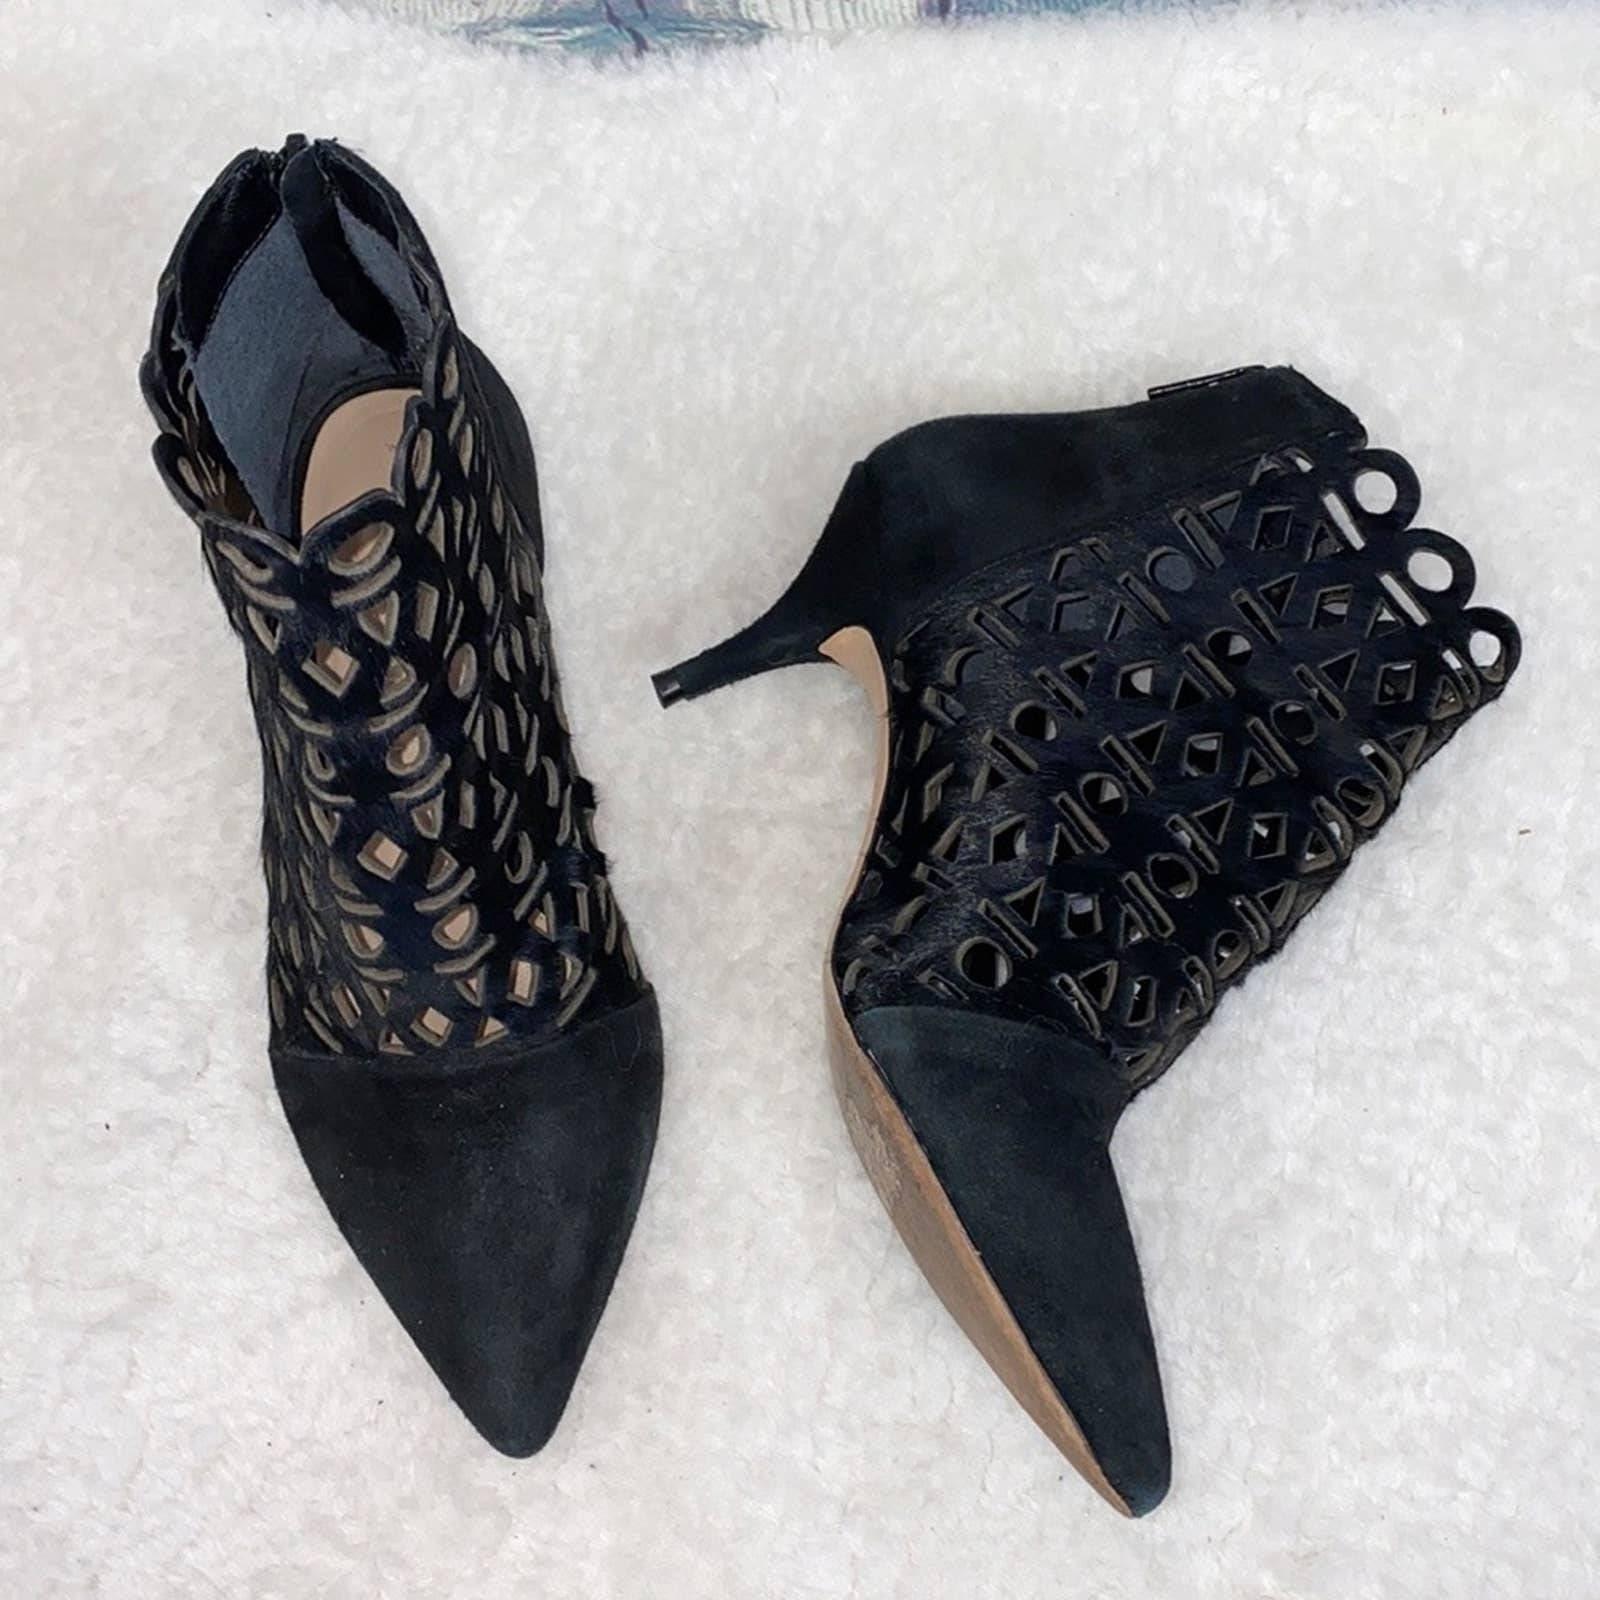 Loeffler Randall Rashida calf hair boots